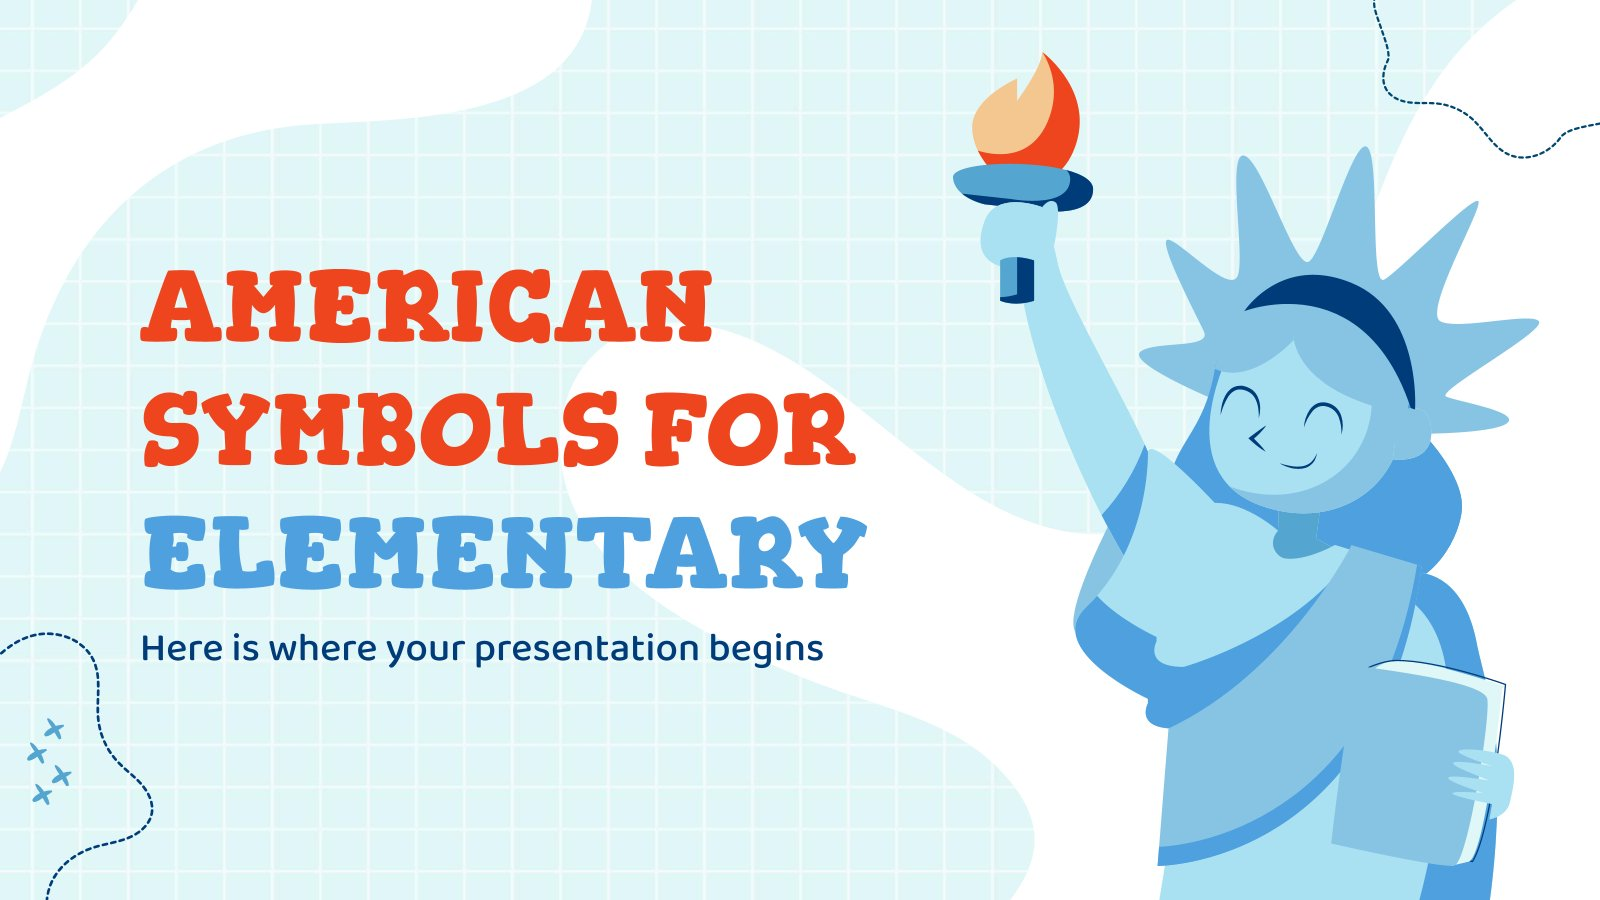 American Symbols for Elementary presentation template